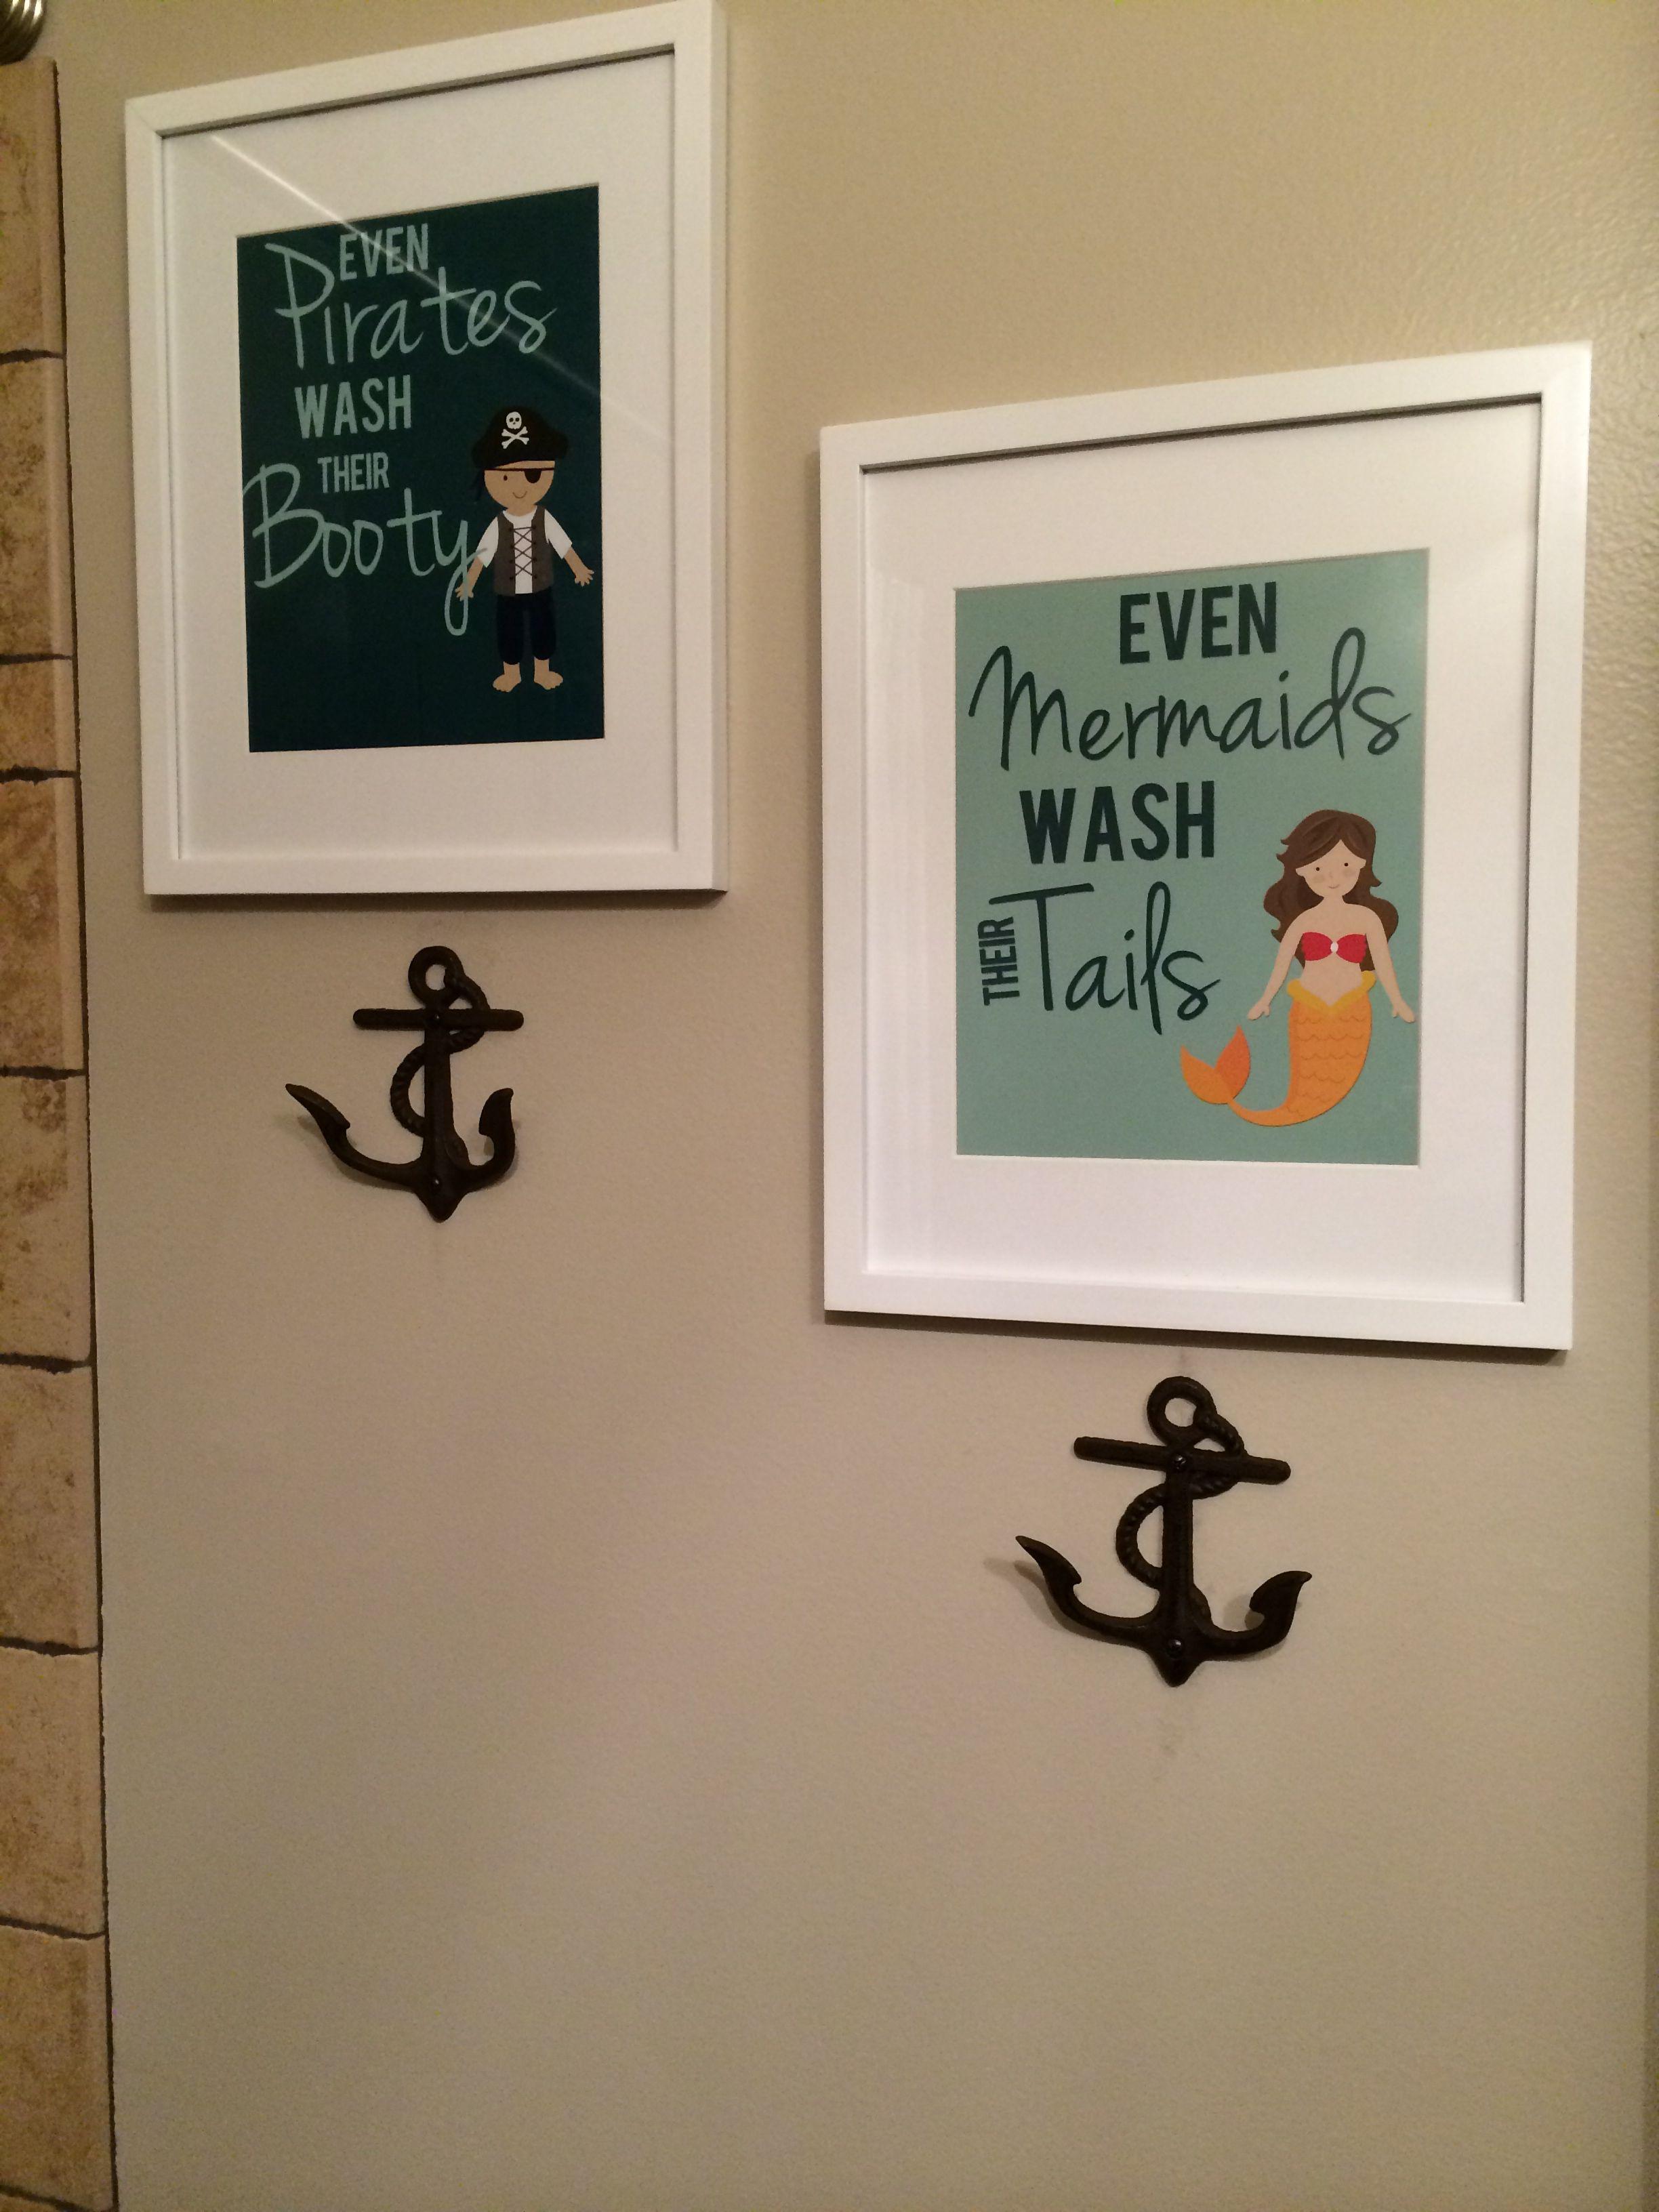 Kids mermaid bathroom decor - How Precious A Little Print For Each One Right Over A Towel Hook For Their Little Mermaid Bathroomocean